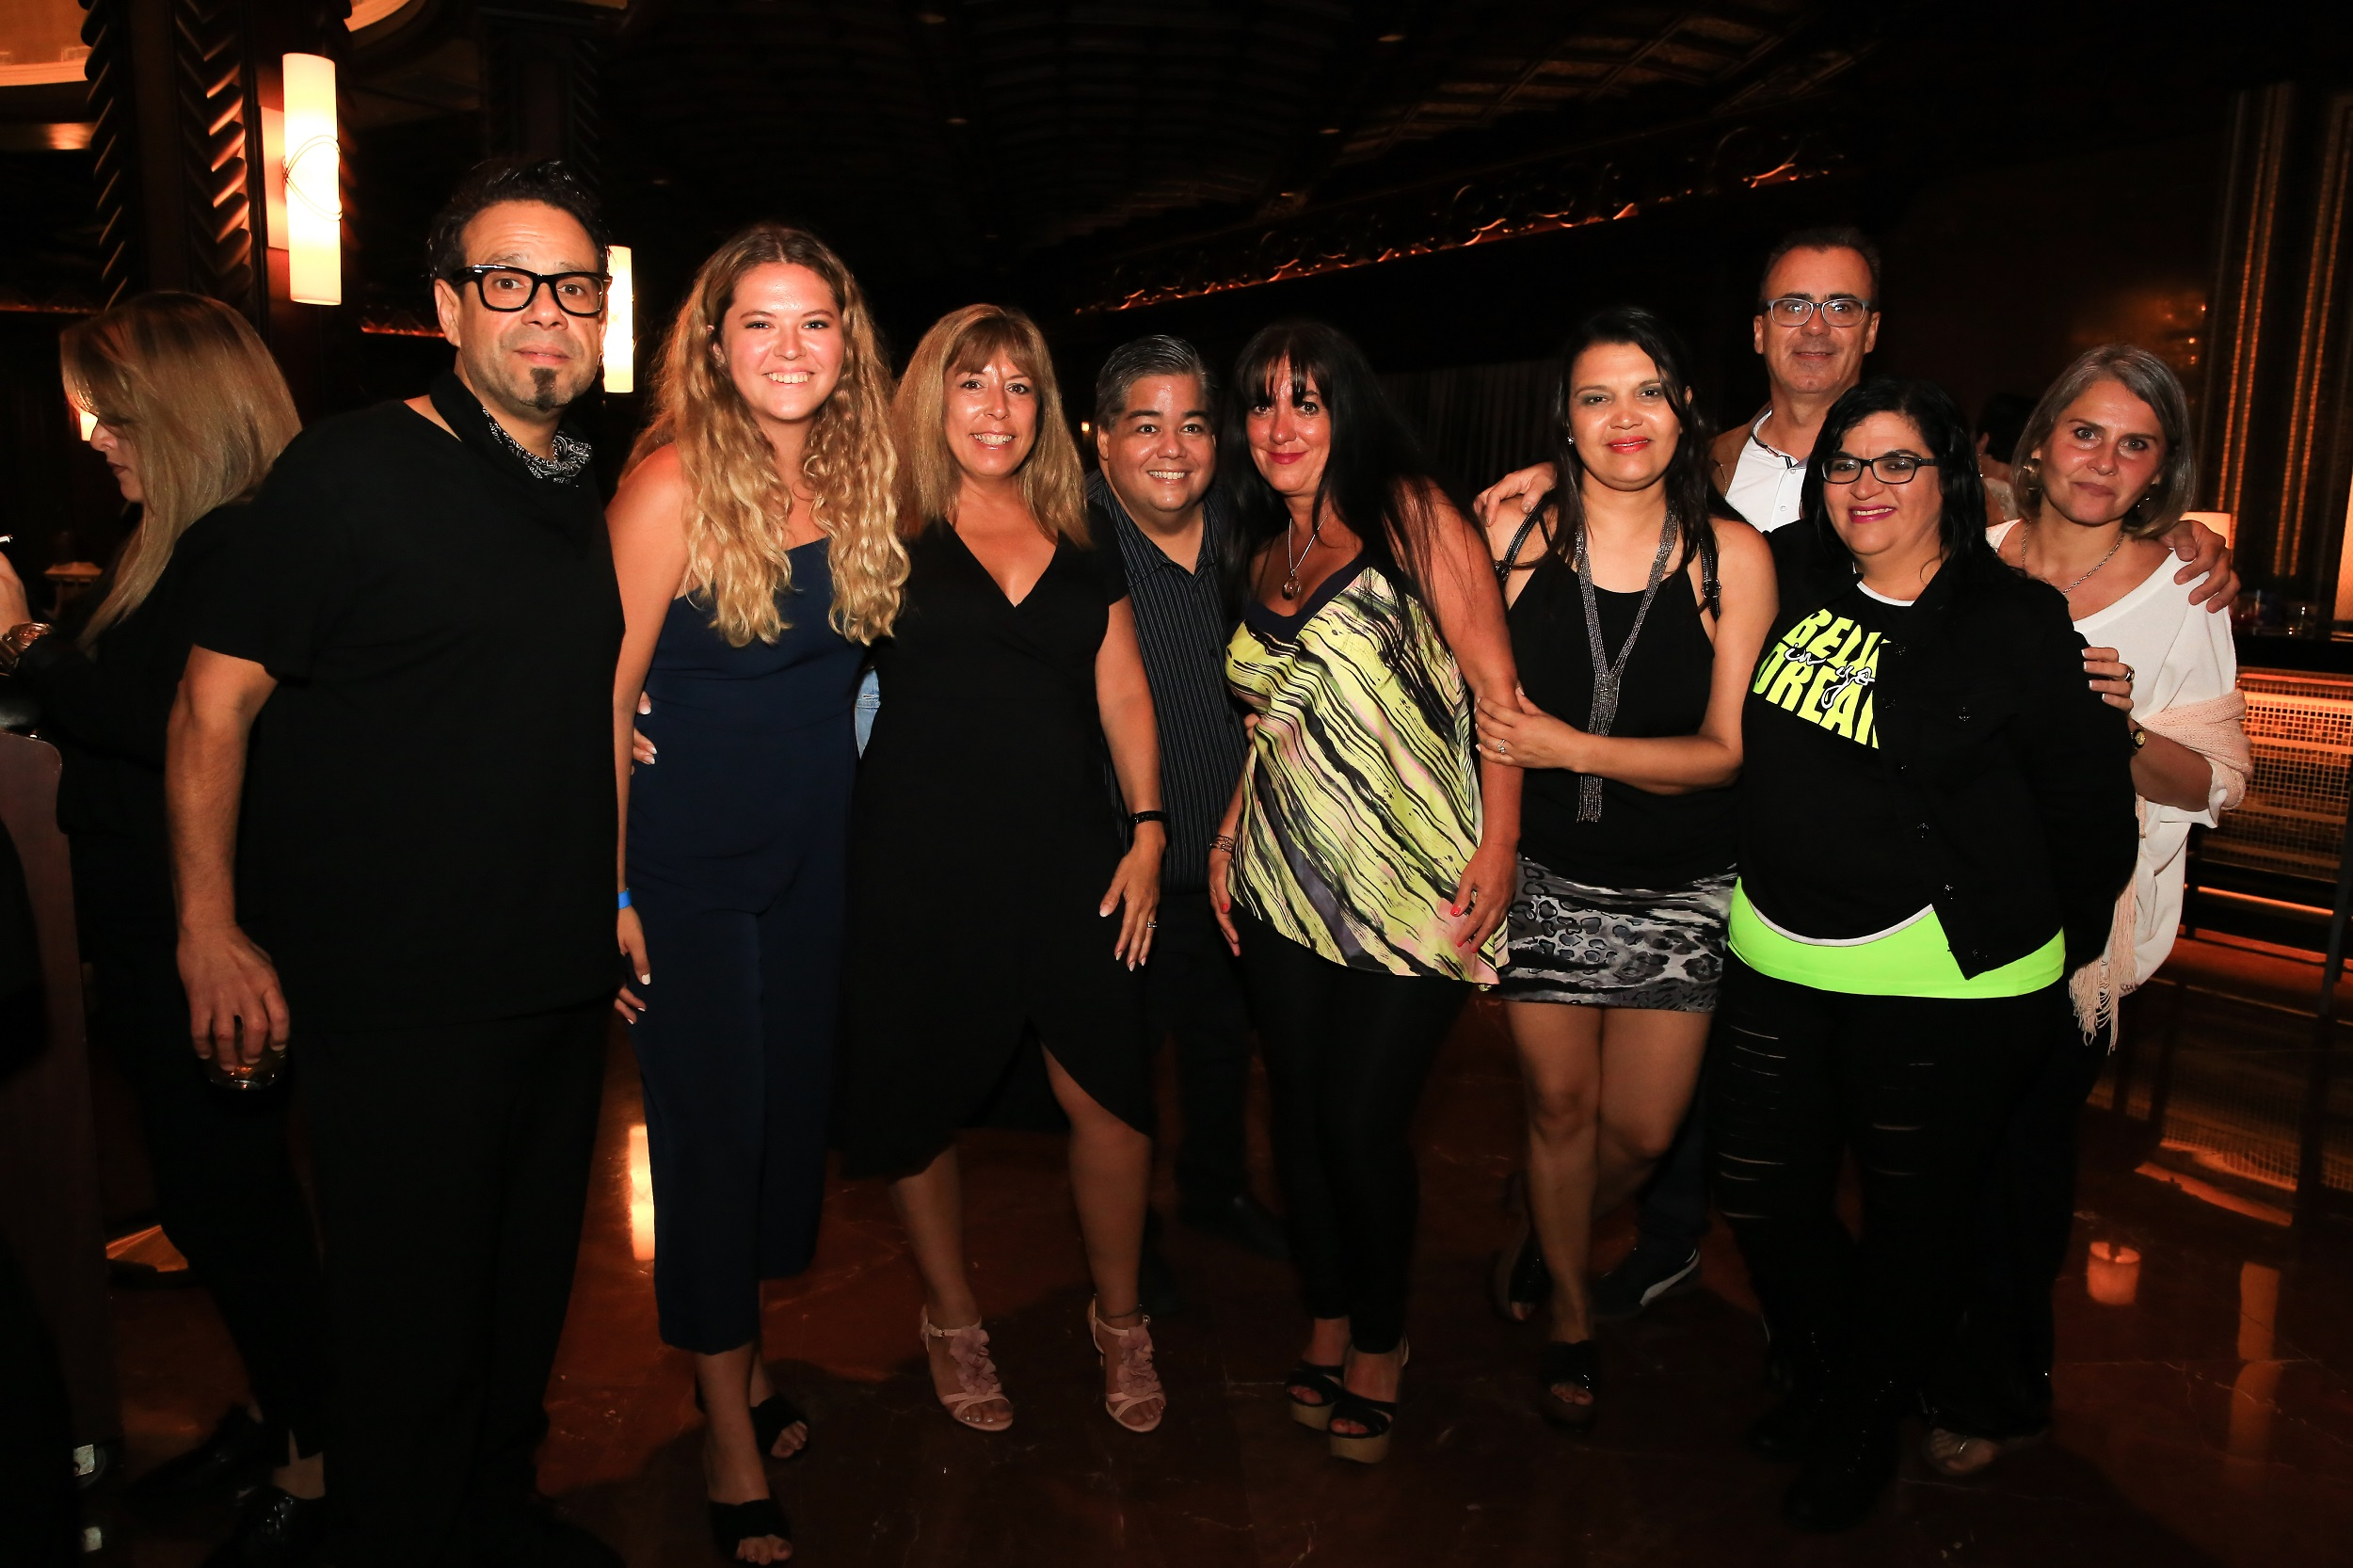 1 Menudo - Rai Torres, Tatiana Hains, Graciela Velazco, William Marrero, Fernanda Sponelli, Sandra Custiriano,Tommy Rivera, Carmen Torres y Sonia Muñoz.jpg